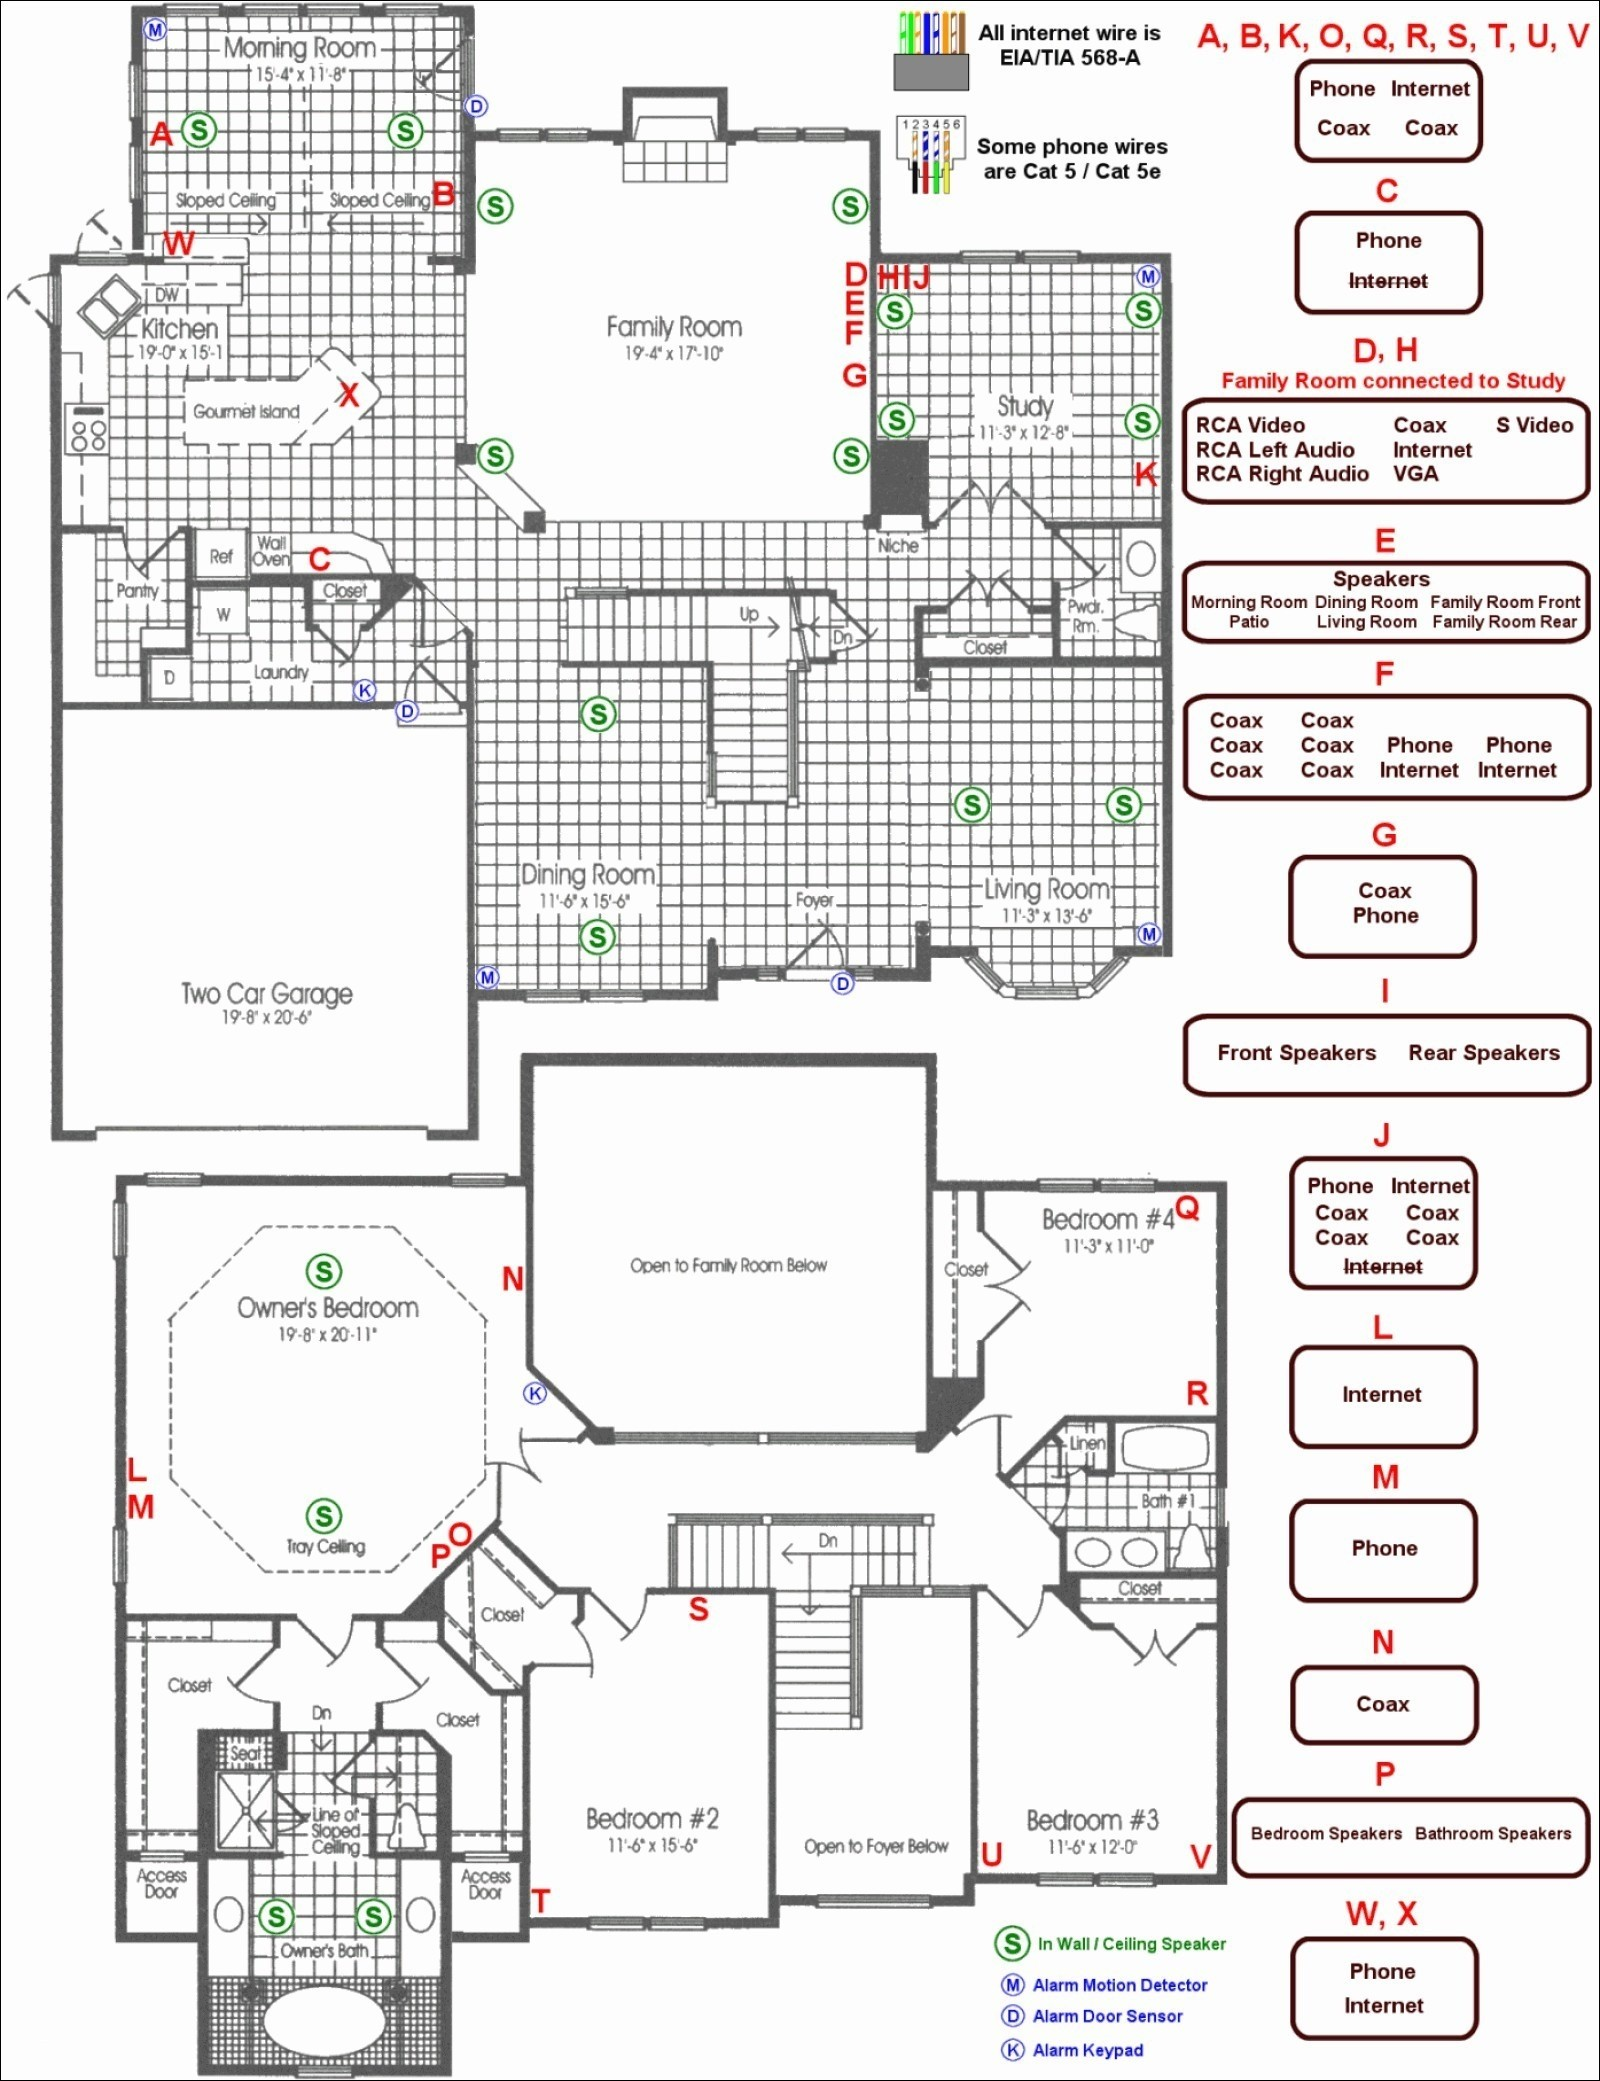 snow plow wiring Aktive Crossoverfrequenzweiche Mit Max4478 360customs Crossover Schematic Rev 0d wiring lighting circuit